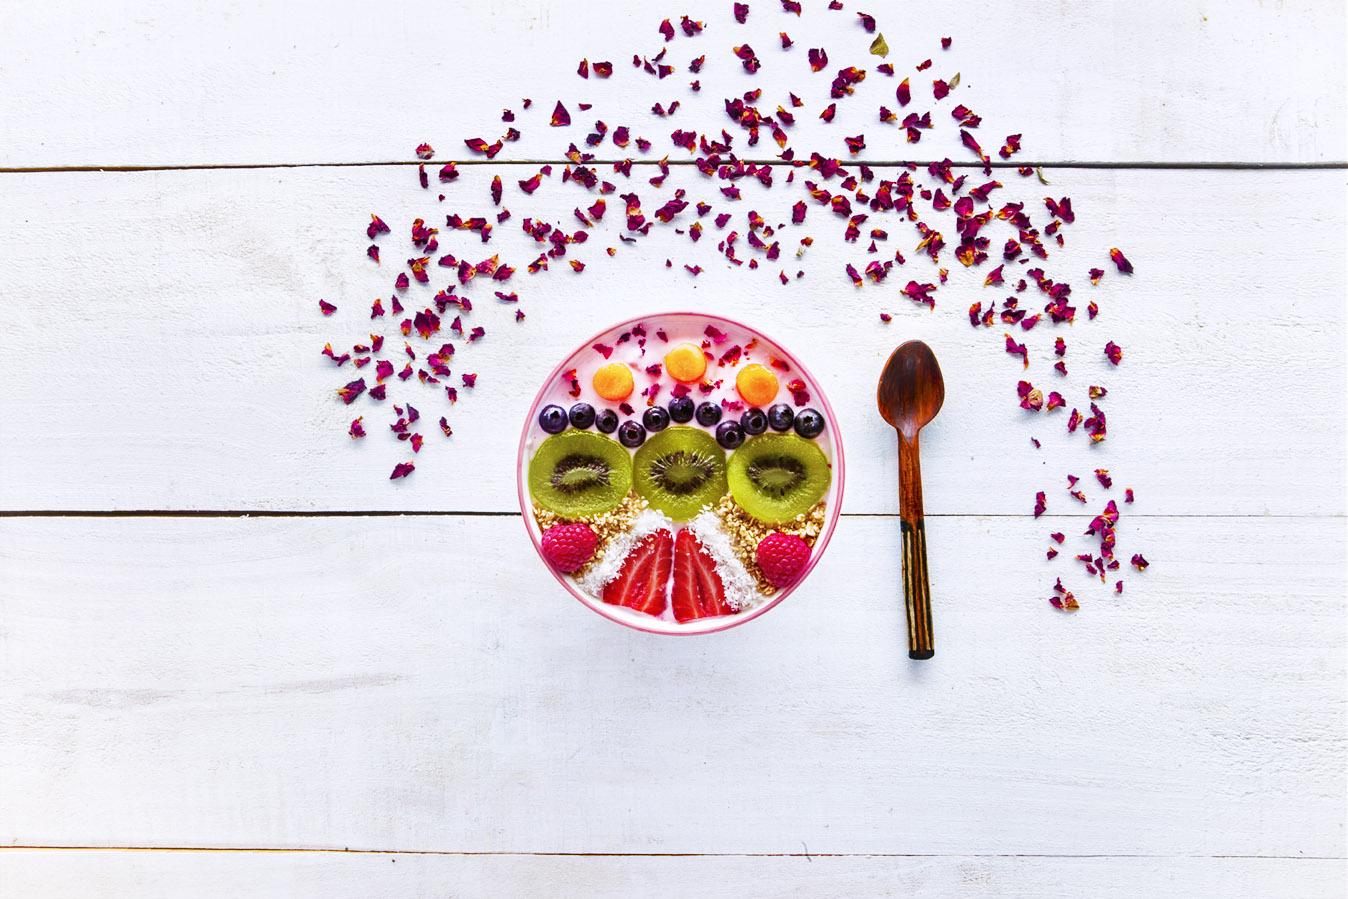 Kaiku-Sin-Lactosa-Recetas-Saludables-Smoothie